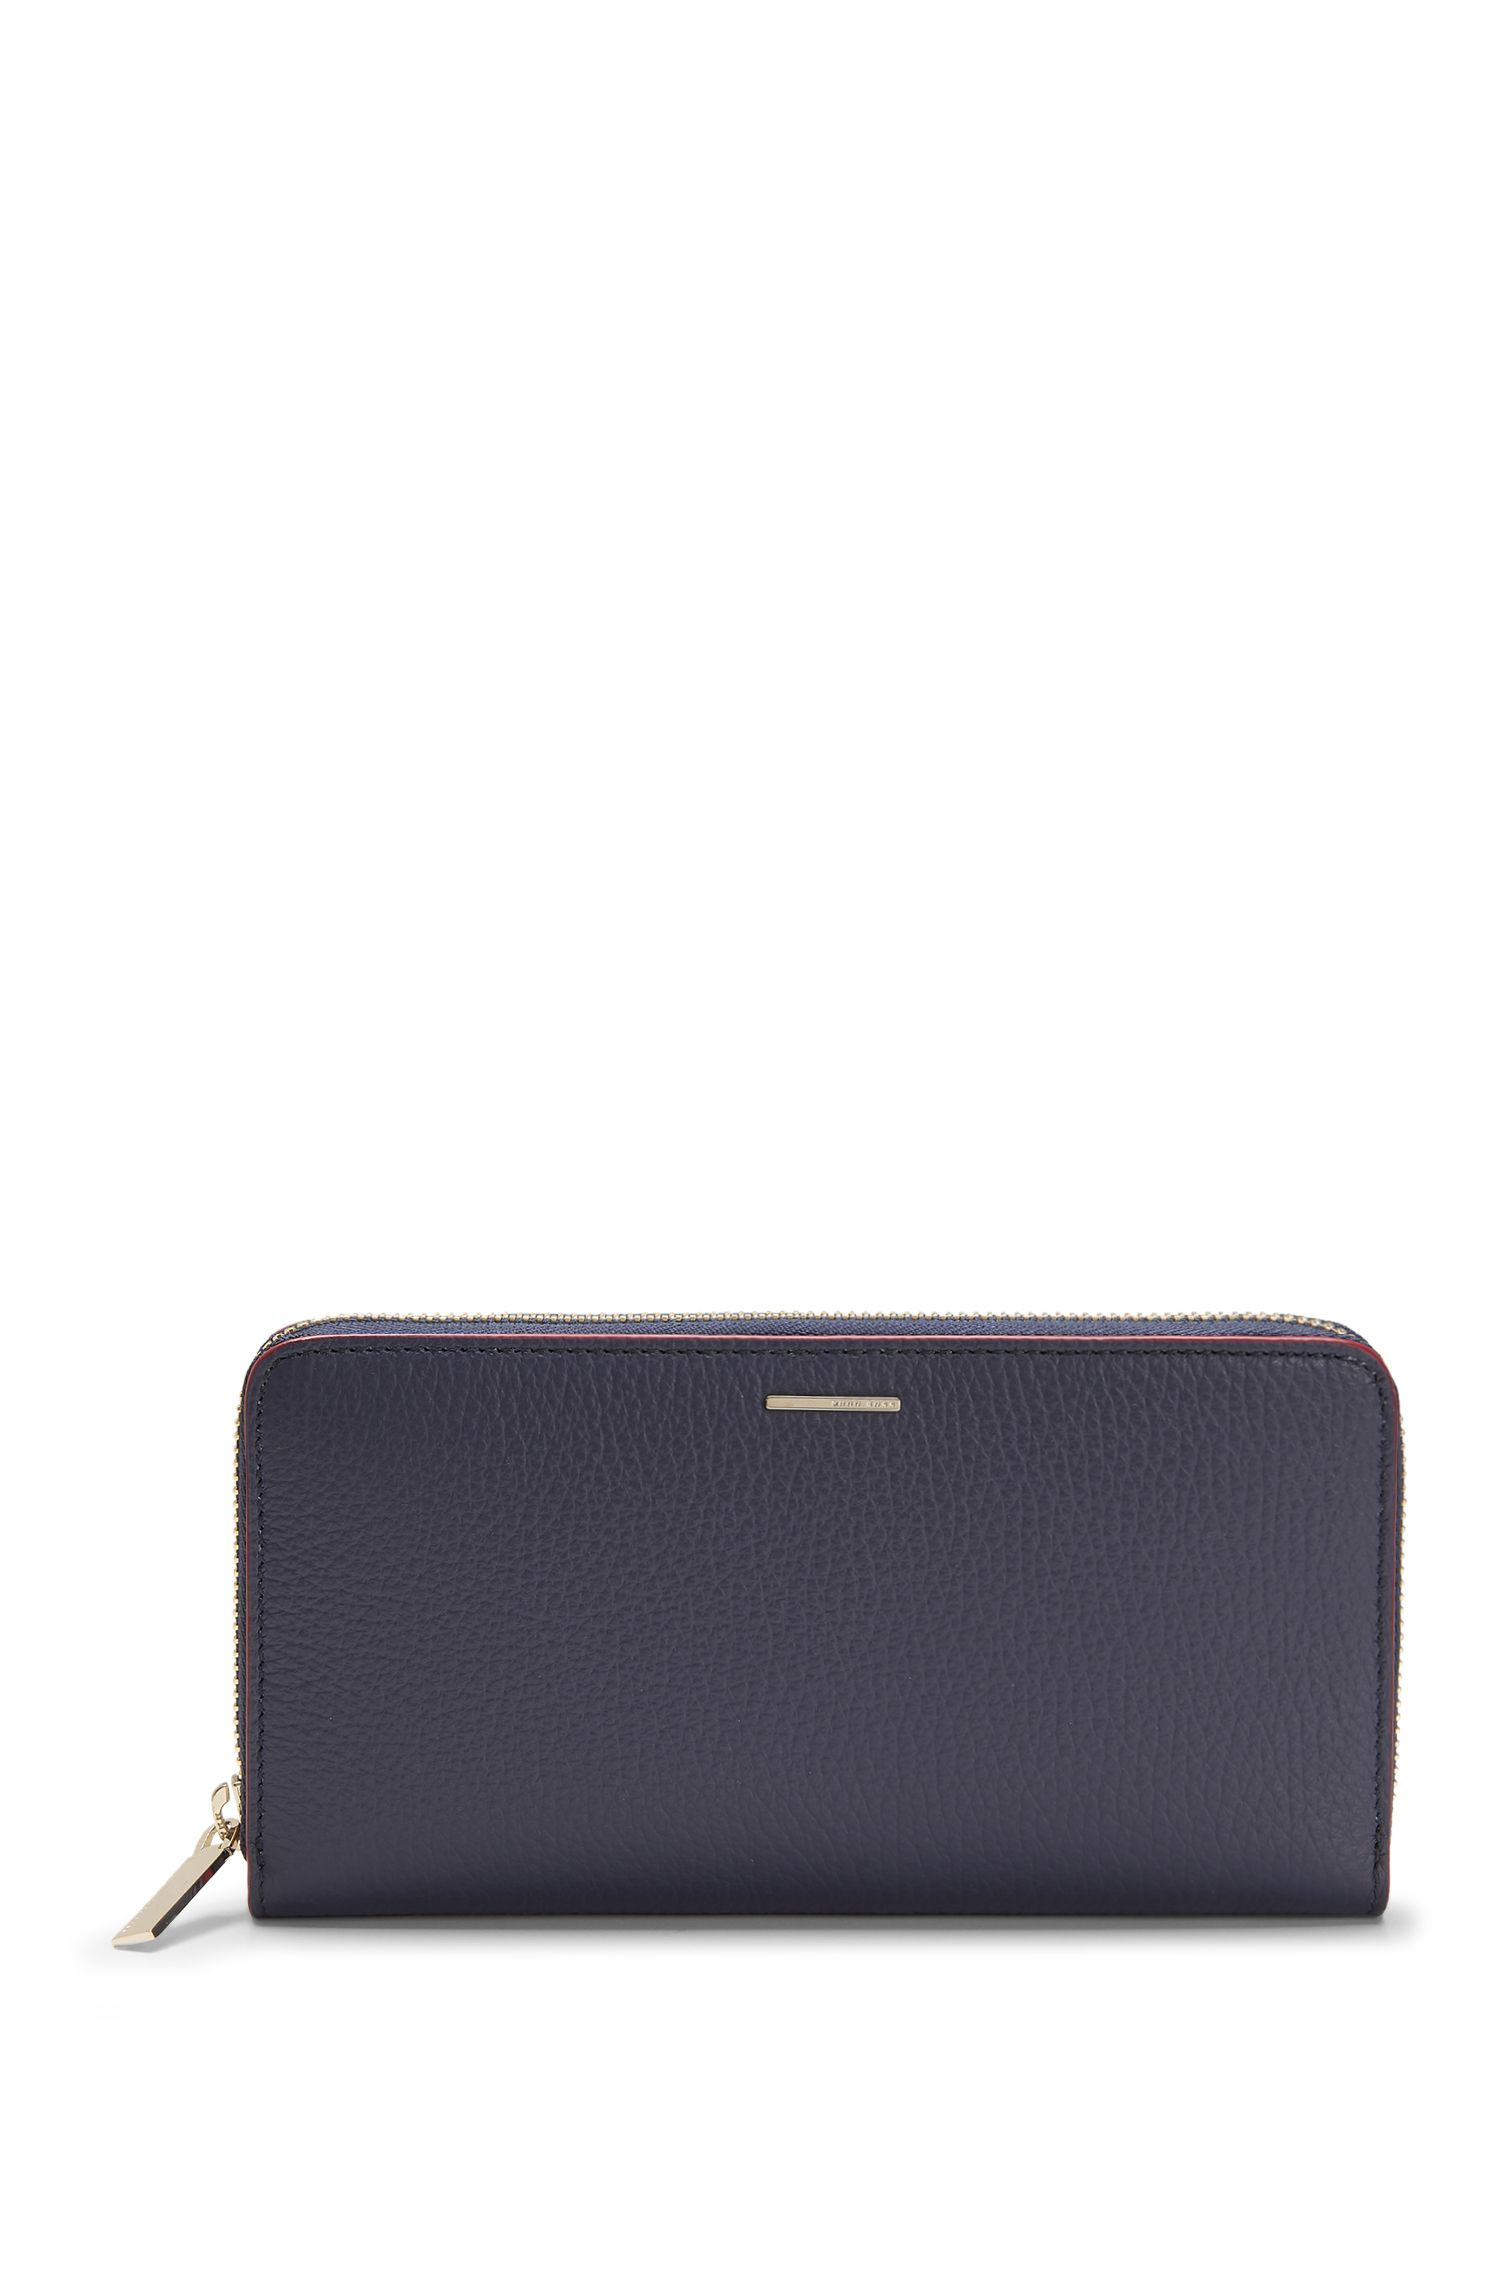 Leather Embossed Zip Wallet | Staple Ziparound A